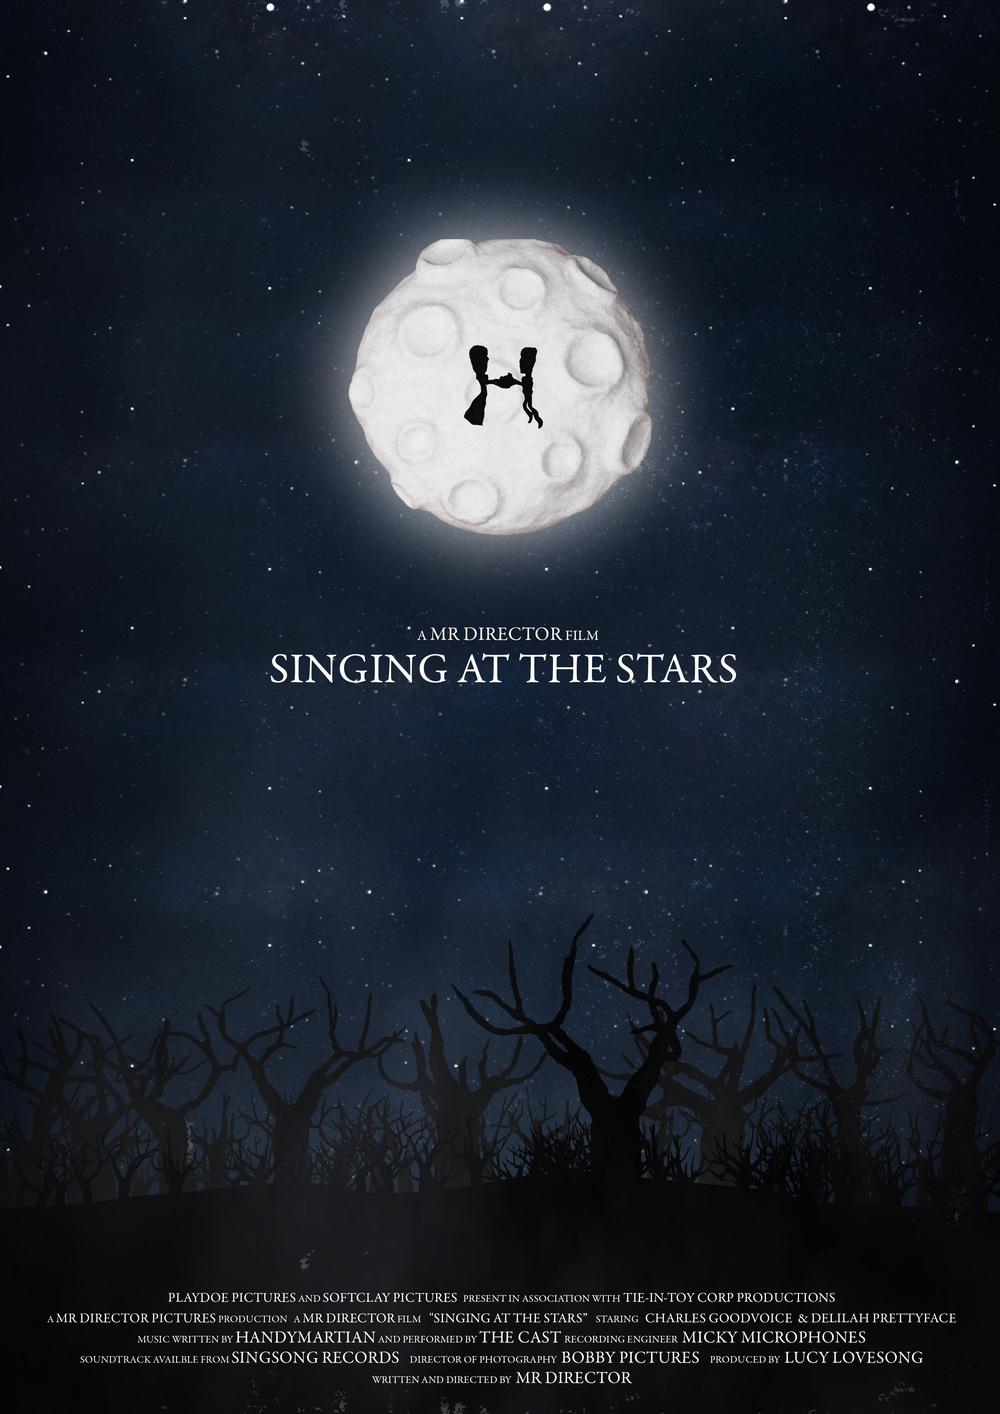 singingatthestars-poster01.jpg